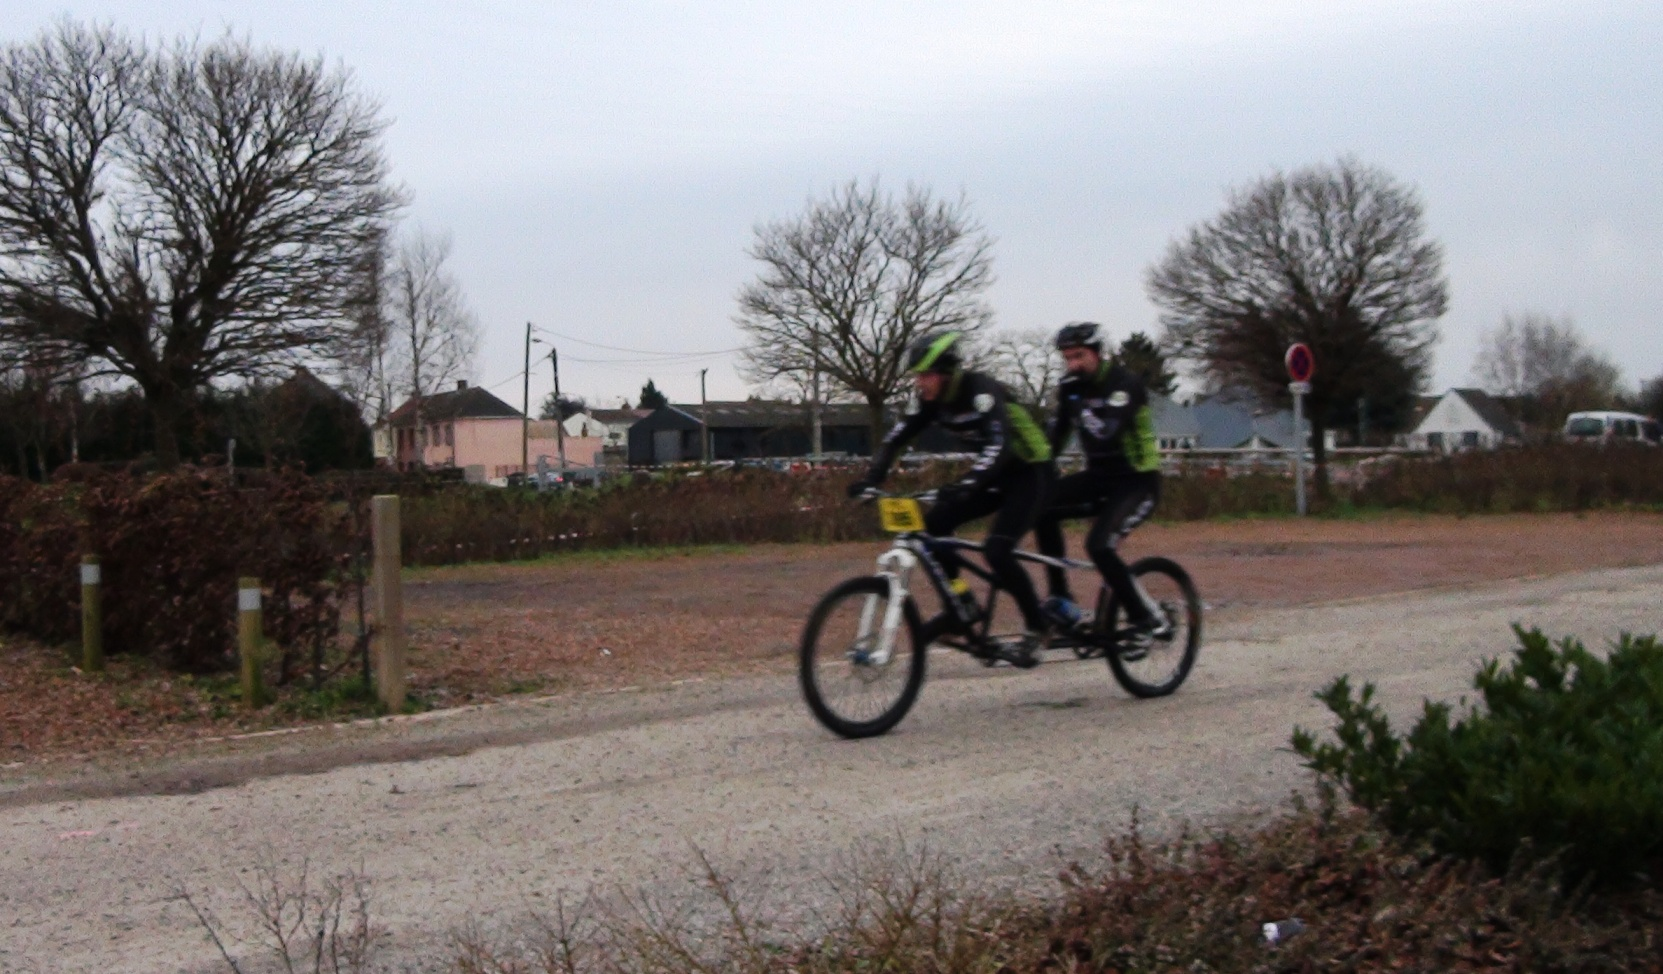 vélo beuvry 62